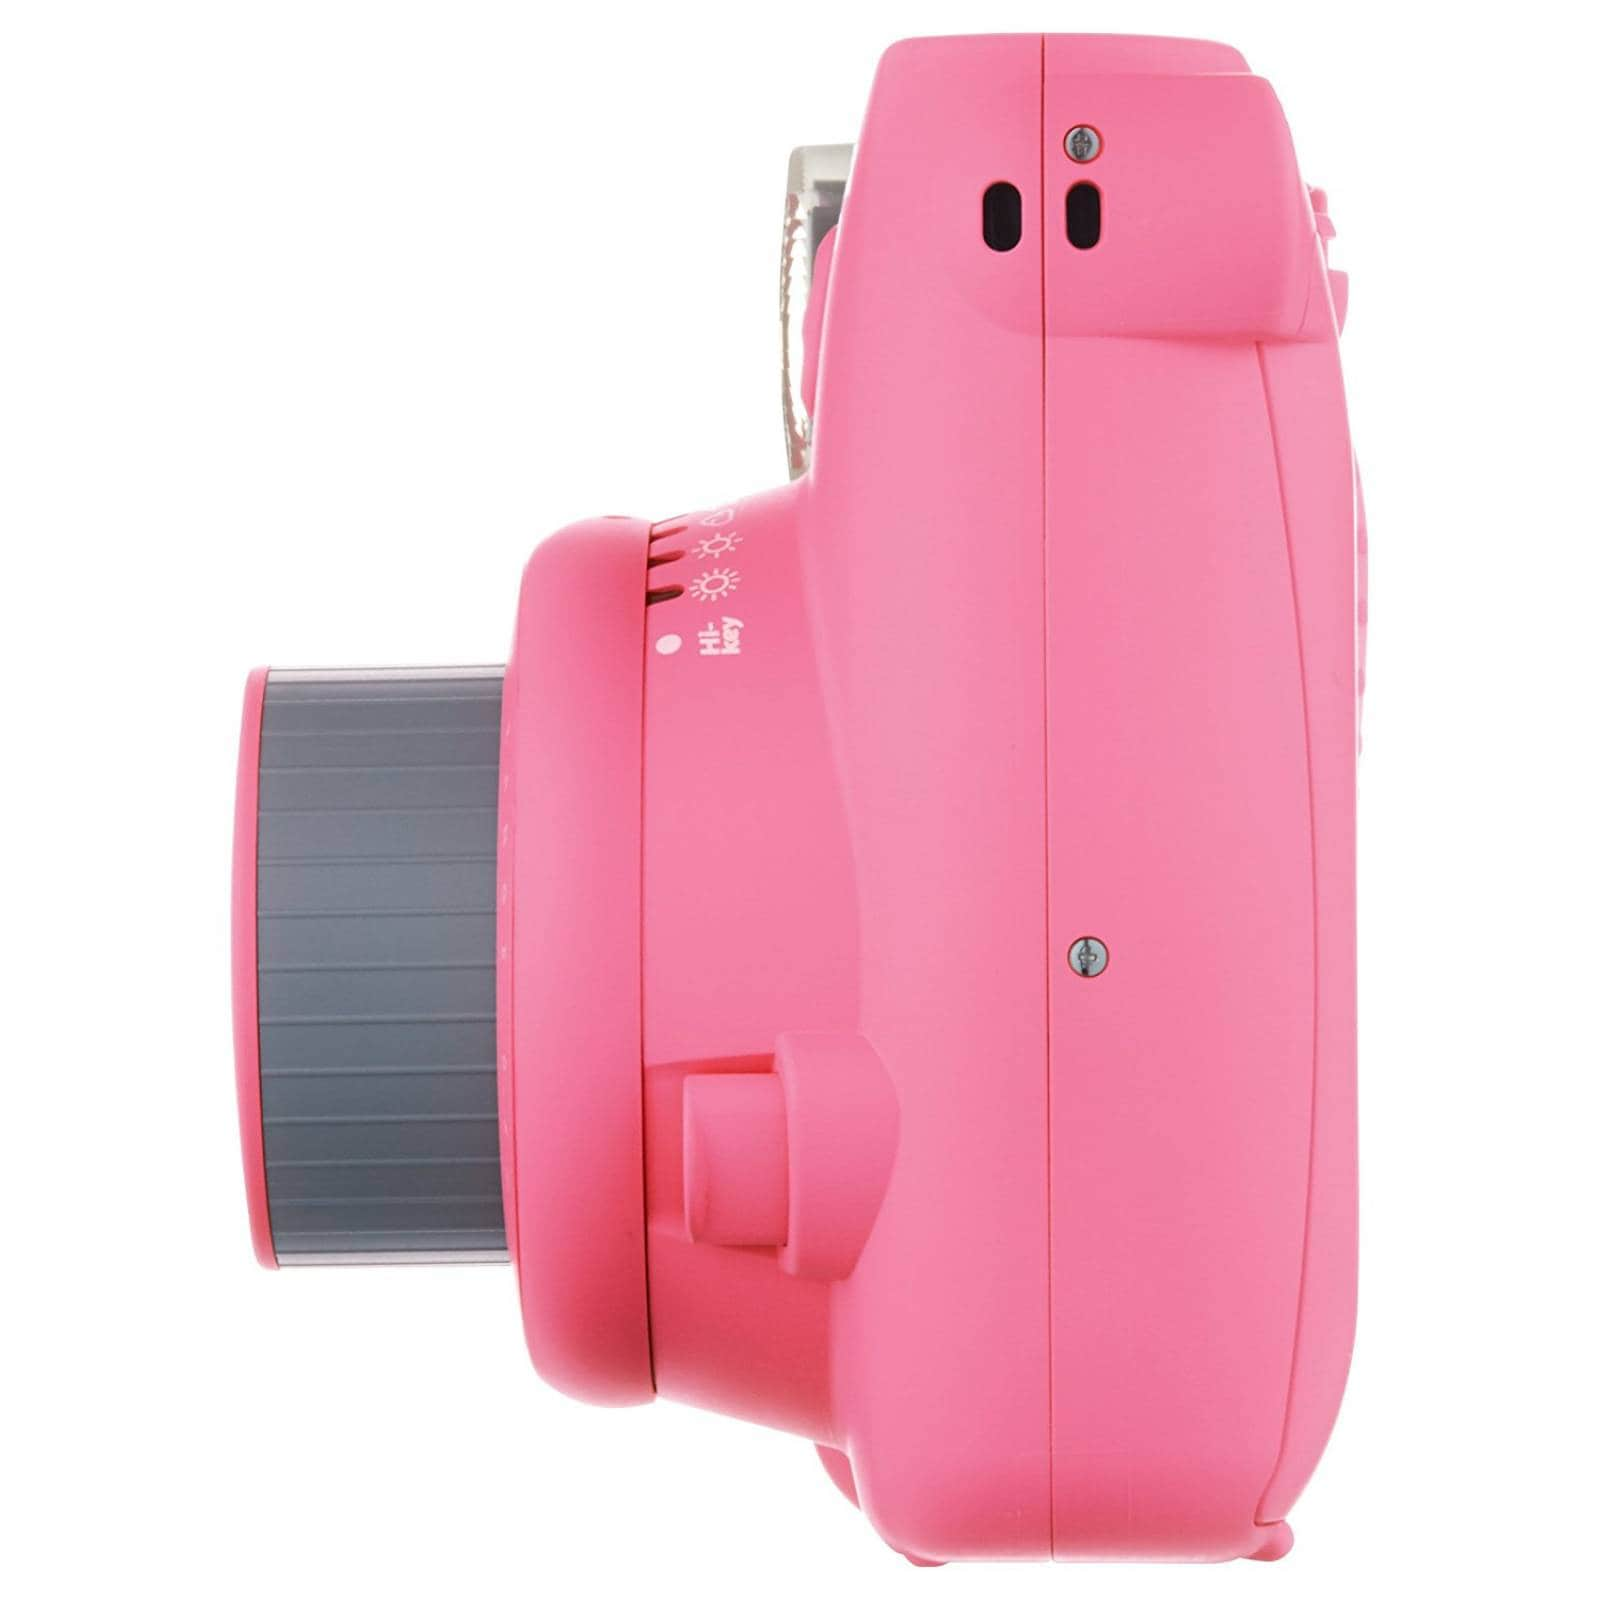 Cámara Instax Mini 9 Fujifilm 35cm A 50cm -rosa Flamingo